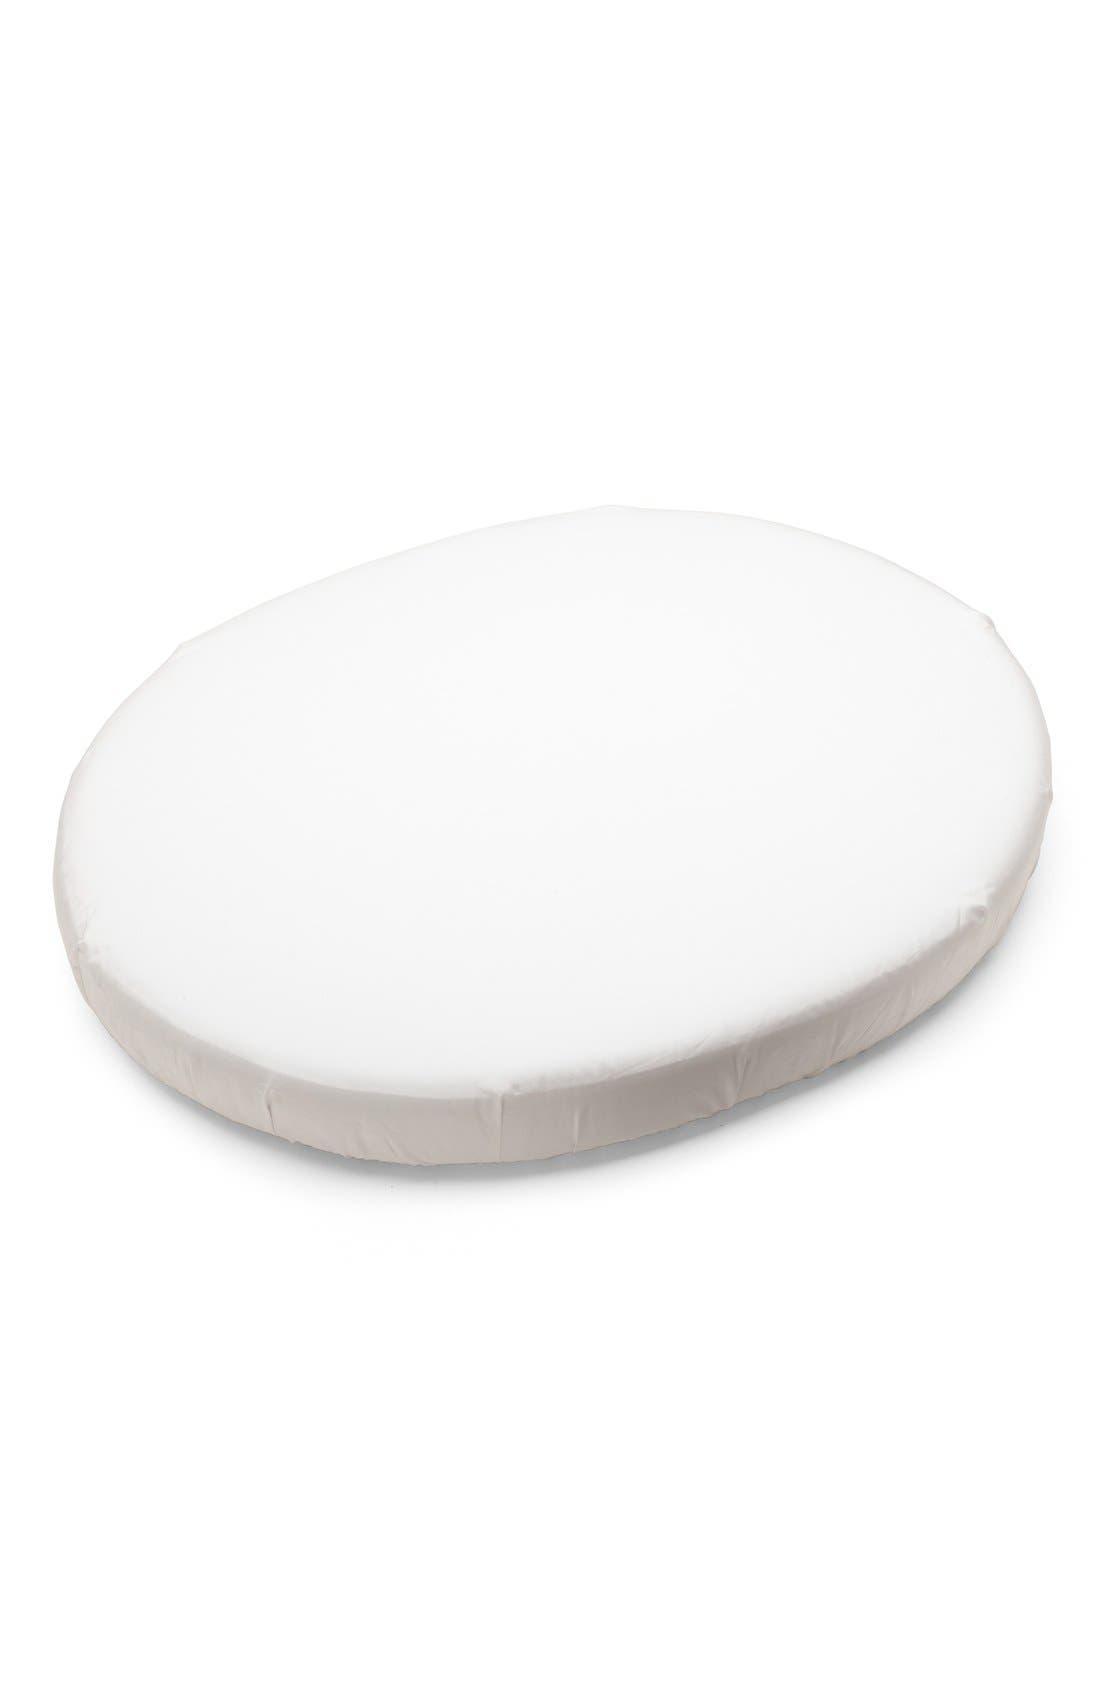 Stokke Sleepi Mini Fitted Cotton Sheet